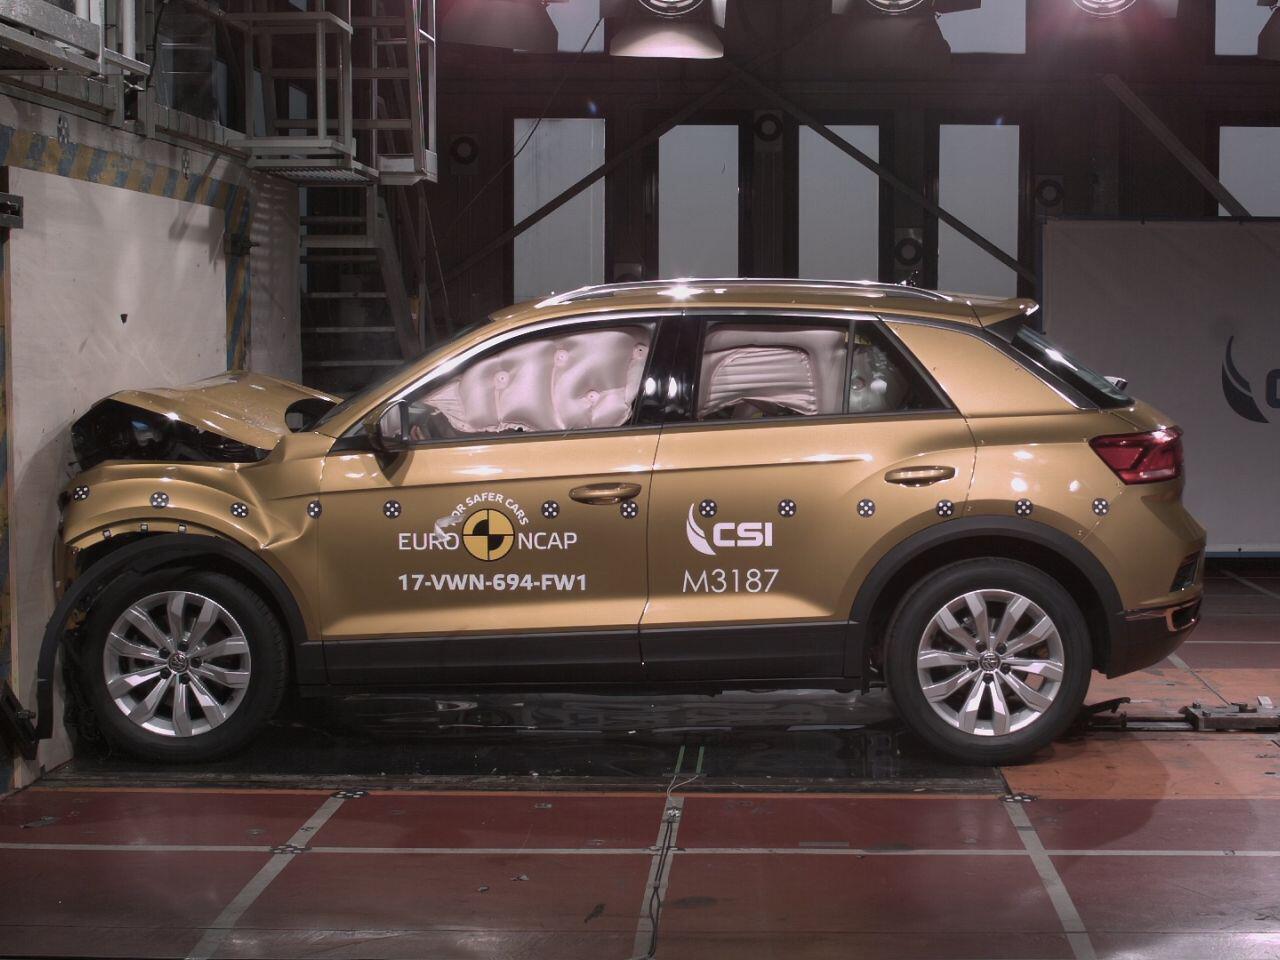 Bild zu Sieger Kompakt-SUV: VW T-Roc